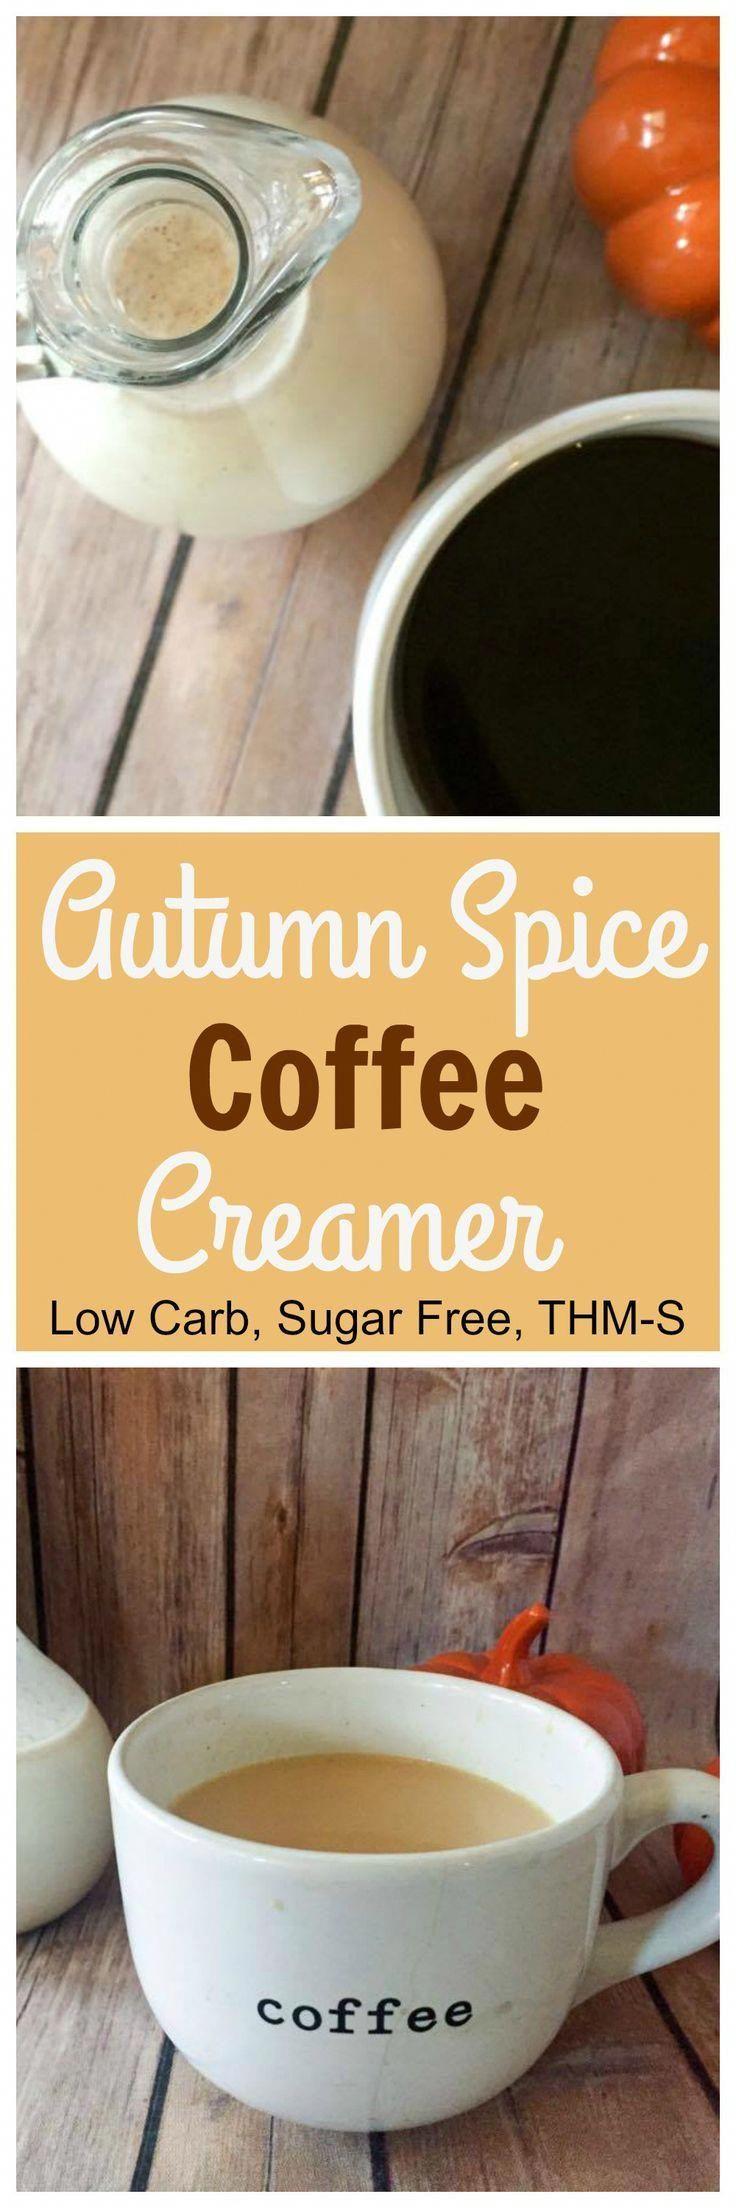 Low Carb, Sugar Free Autumn Spice Coffee Creamer THMS